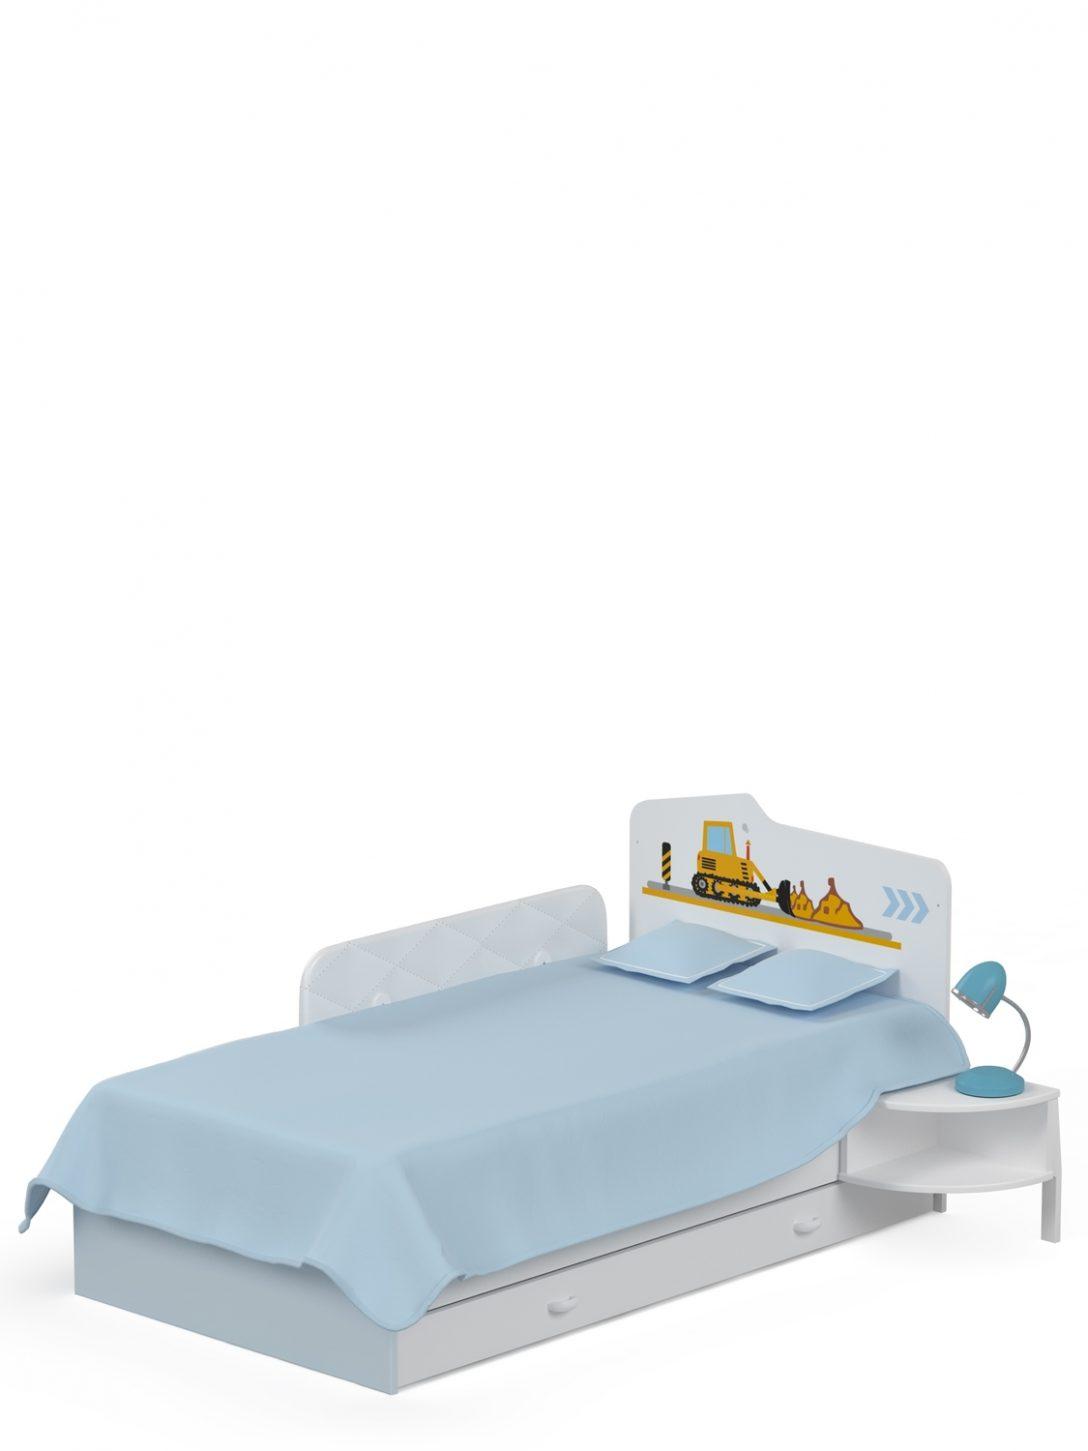 Large Size of Bett 120x200 Builder Meblik Steens Wand Metall Weiß 160x200 Platzsparend Mit Matratze Und Lattenrost Weißes Unterbett Jensen Betten Massivholz Schubladen Bett 120x200 Bett